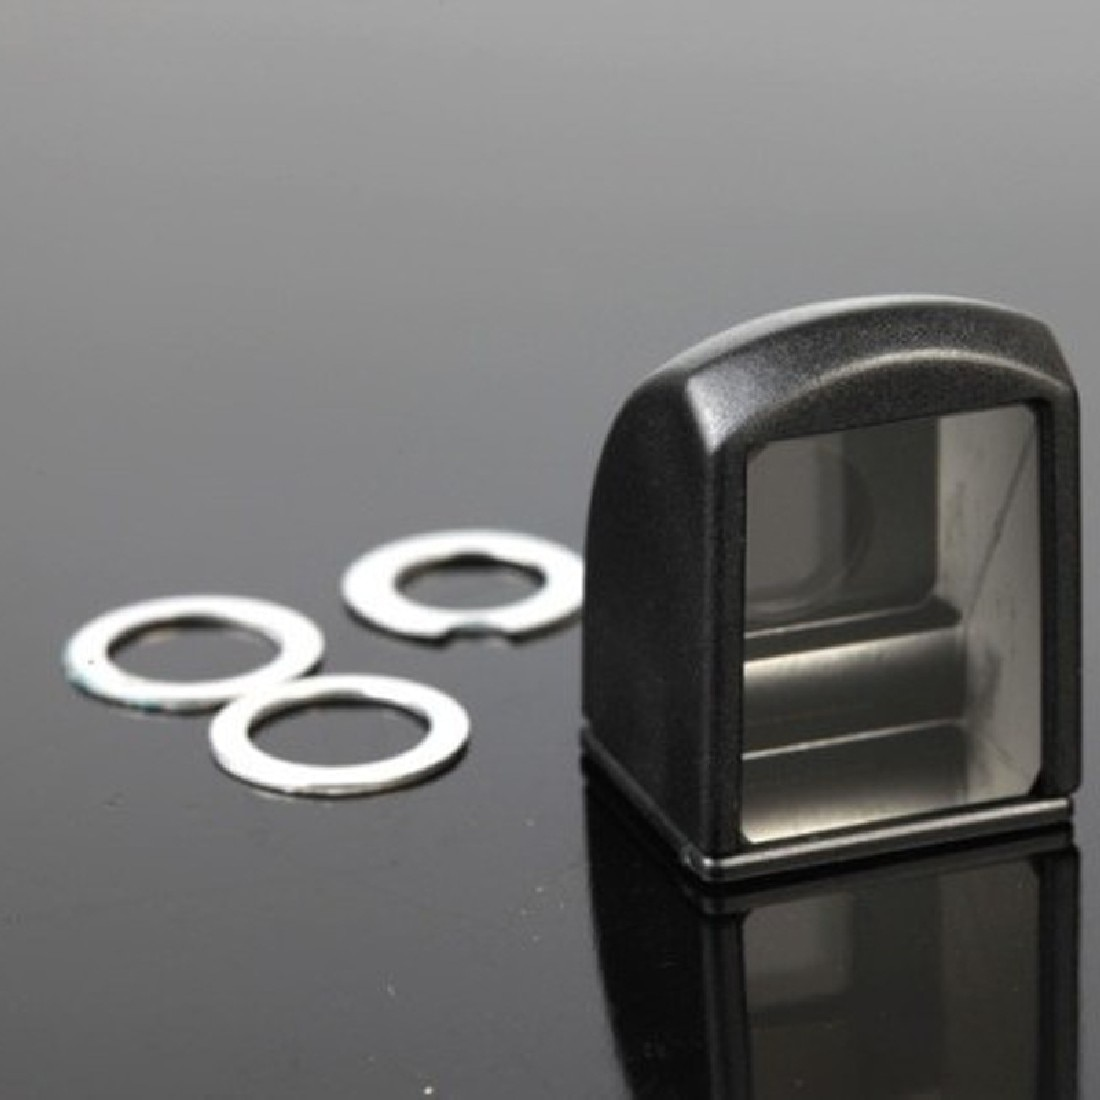 Etmakit Universal Mini Detachable Magnetic Periscope Lens Mobile Phone Lens for iPhone Samsung HTC